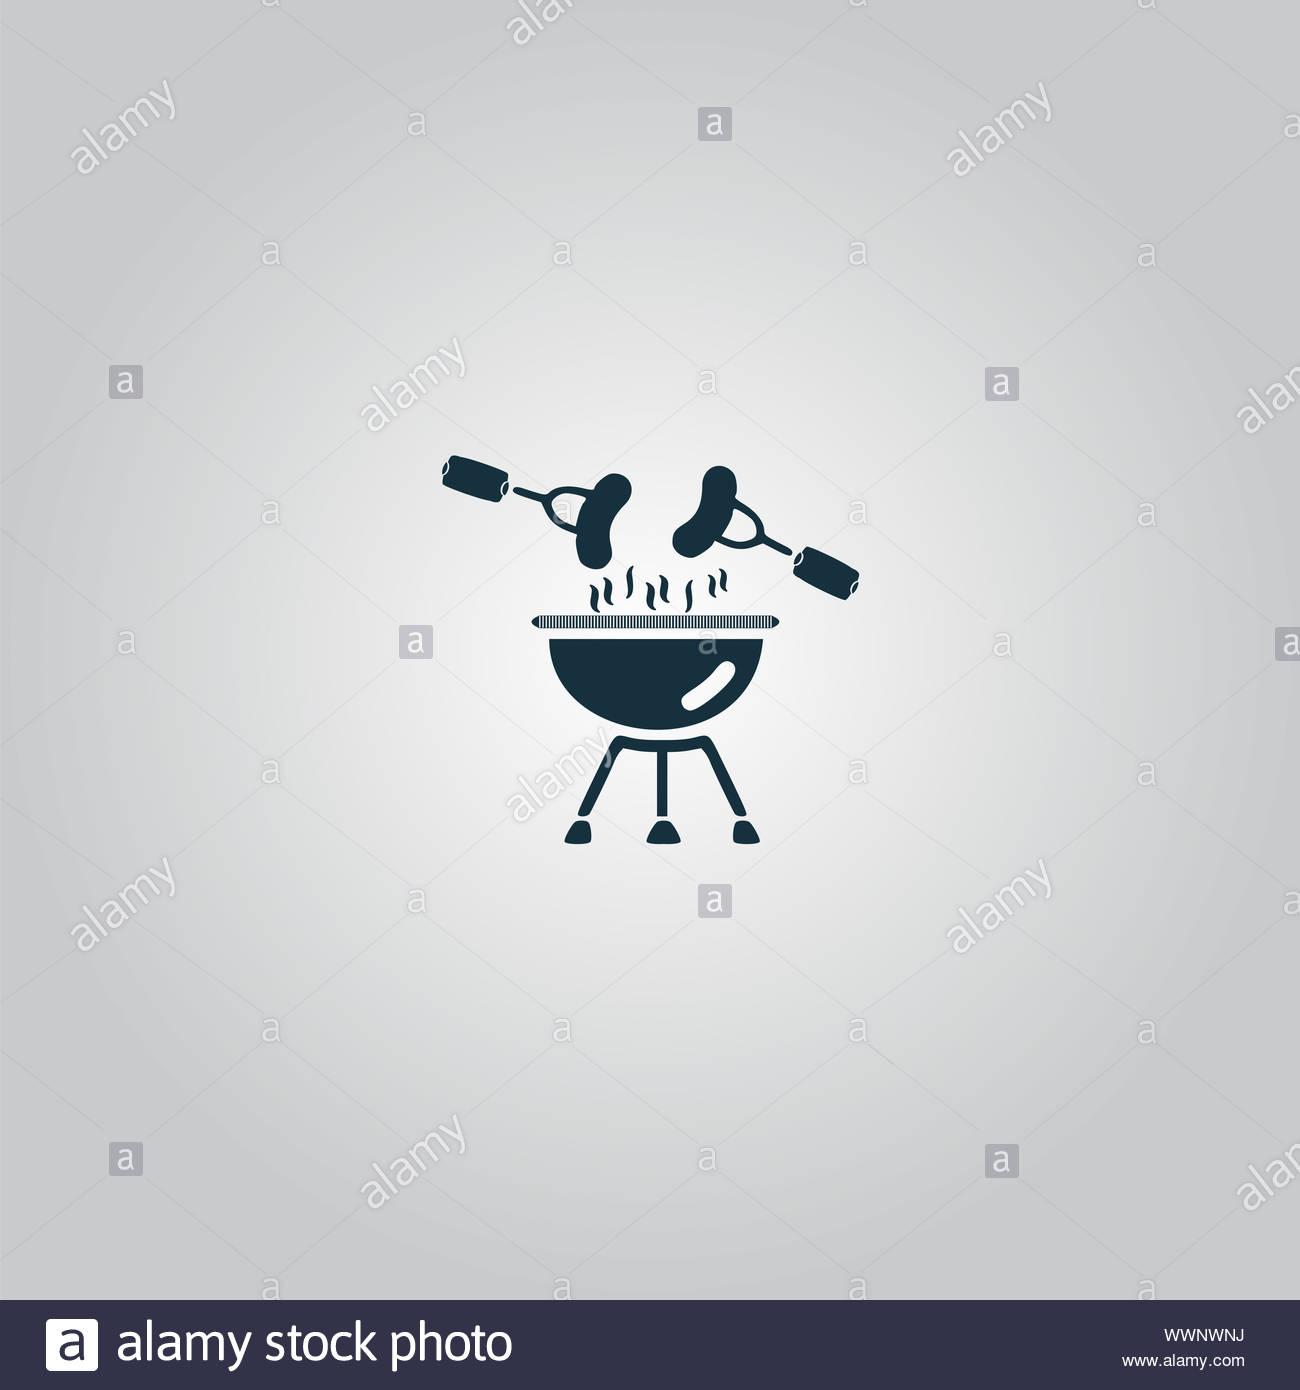 Grill Or Barbecue Icon Stock Photo